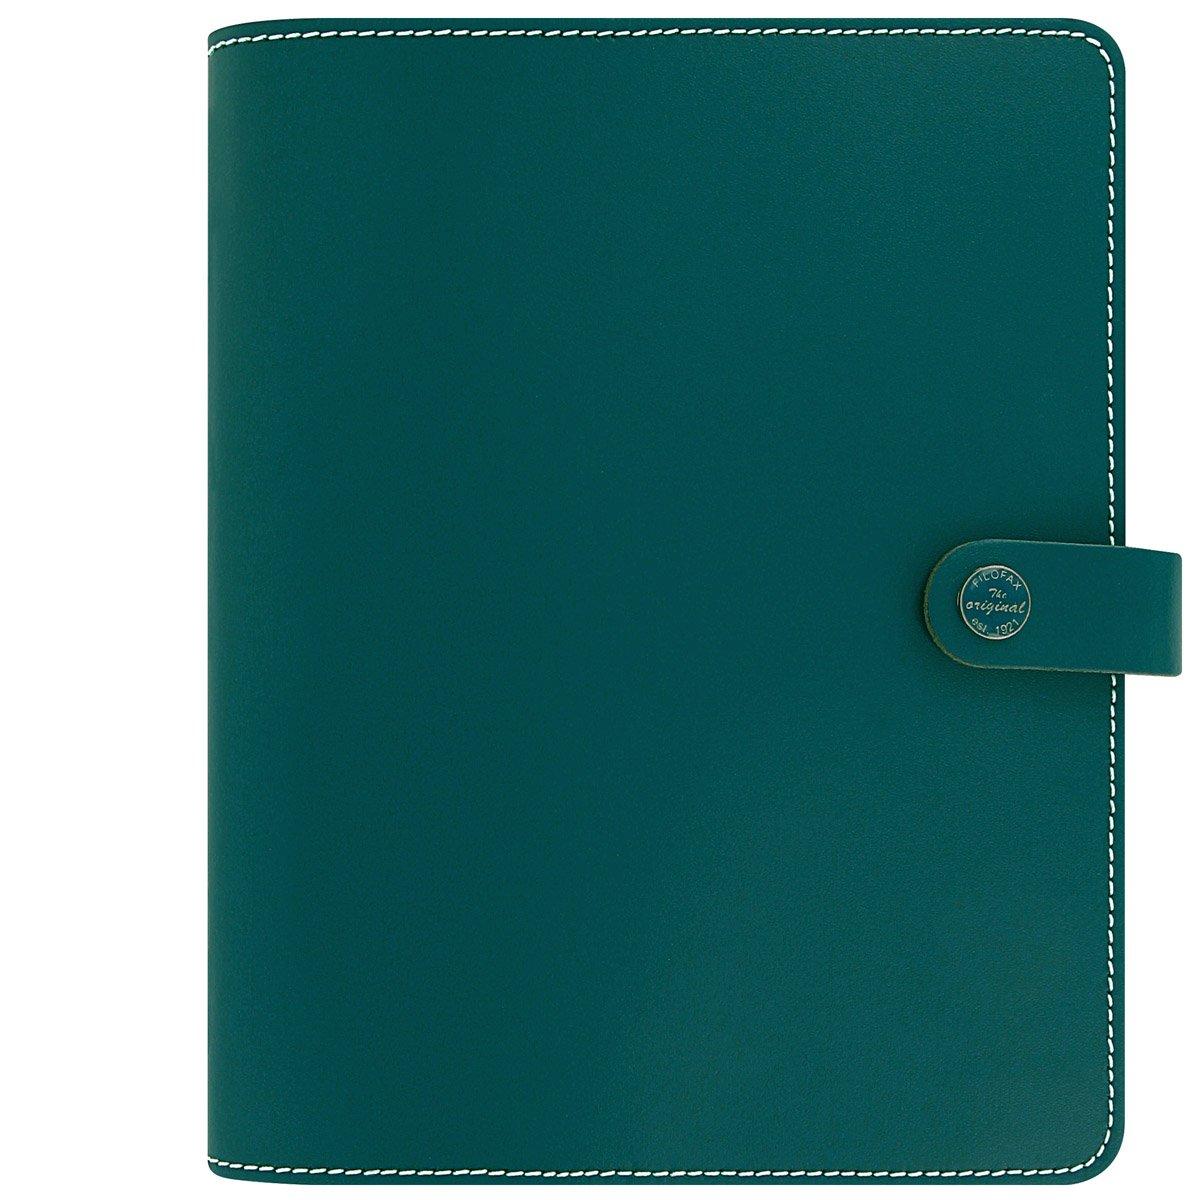 Filofax Original Agenda A5 Turquoise AY-022383 organiseur The Original